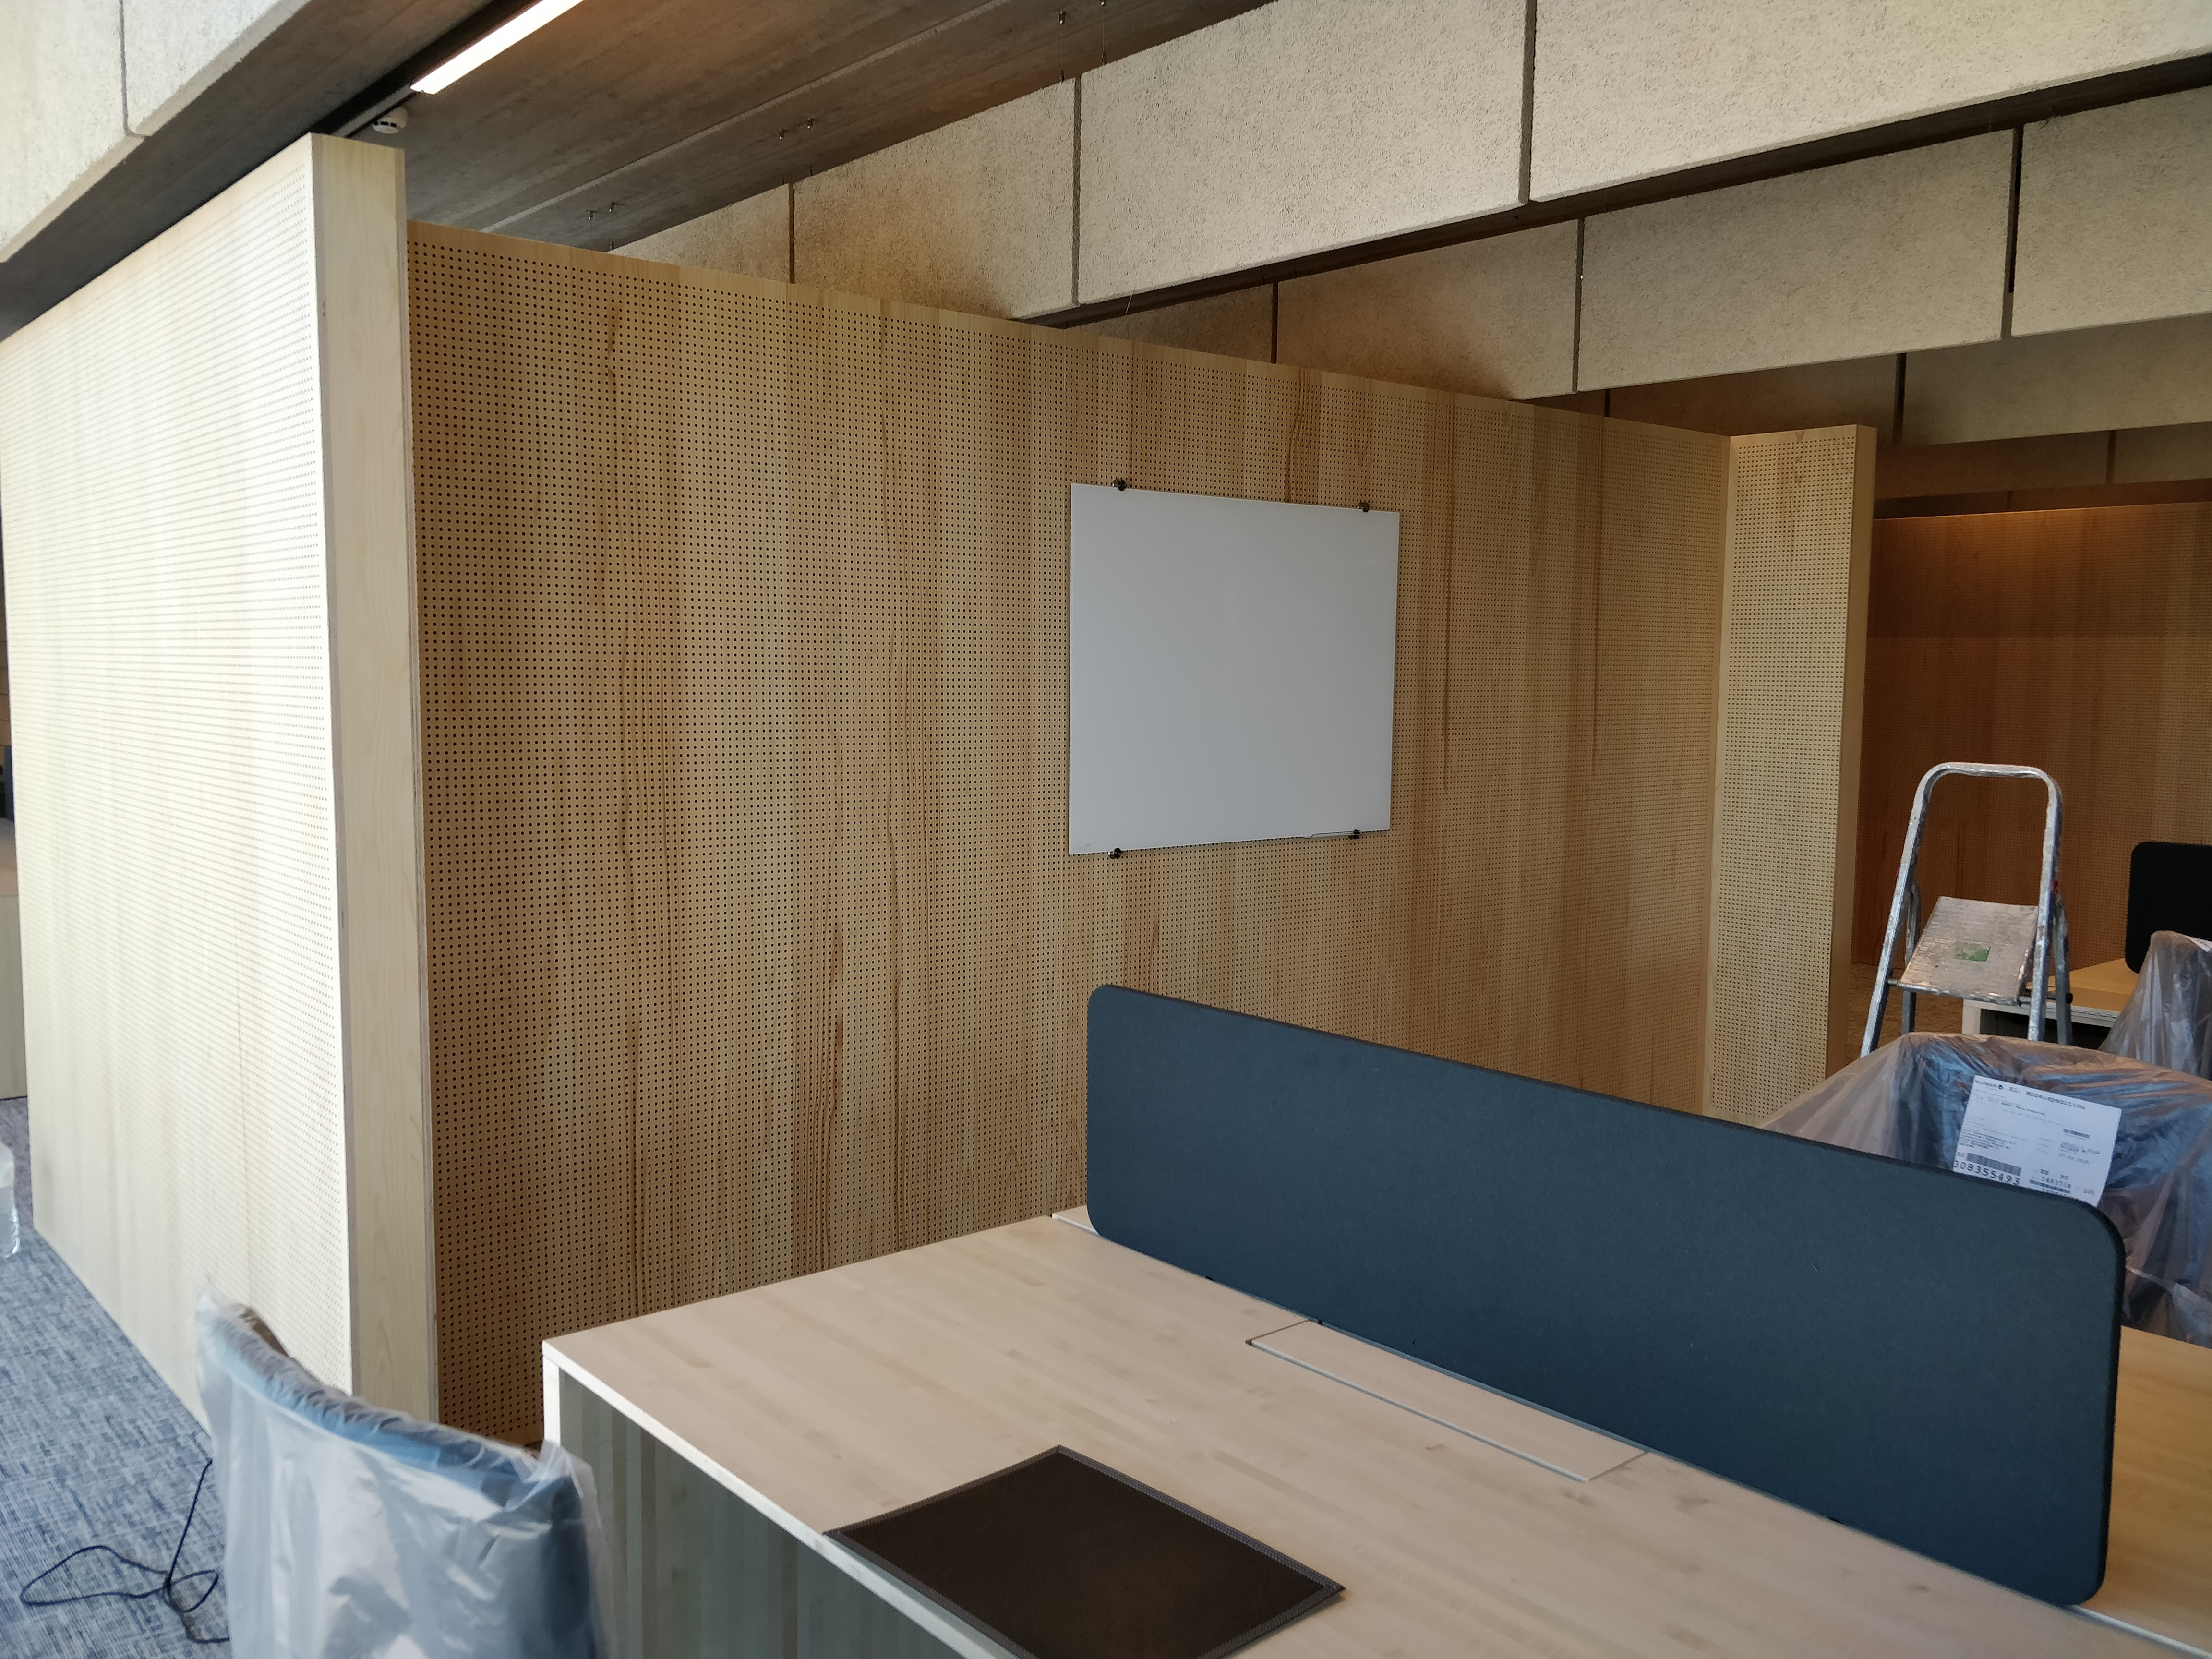 Club Brugge - Marcelis Smart Office - Legamaster glasbord - Belgie - Vlaams brabant